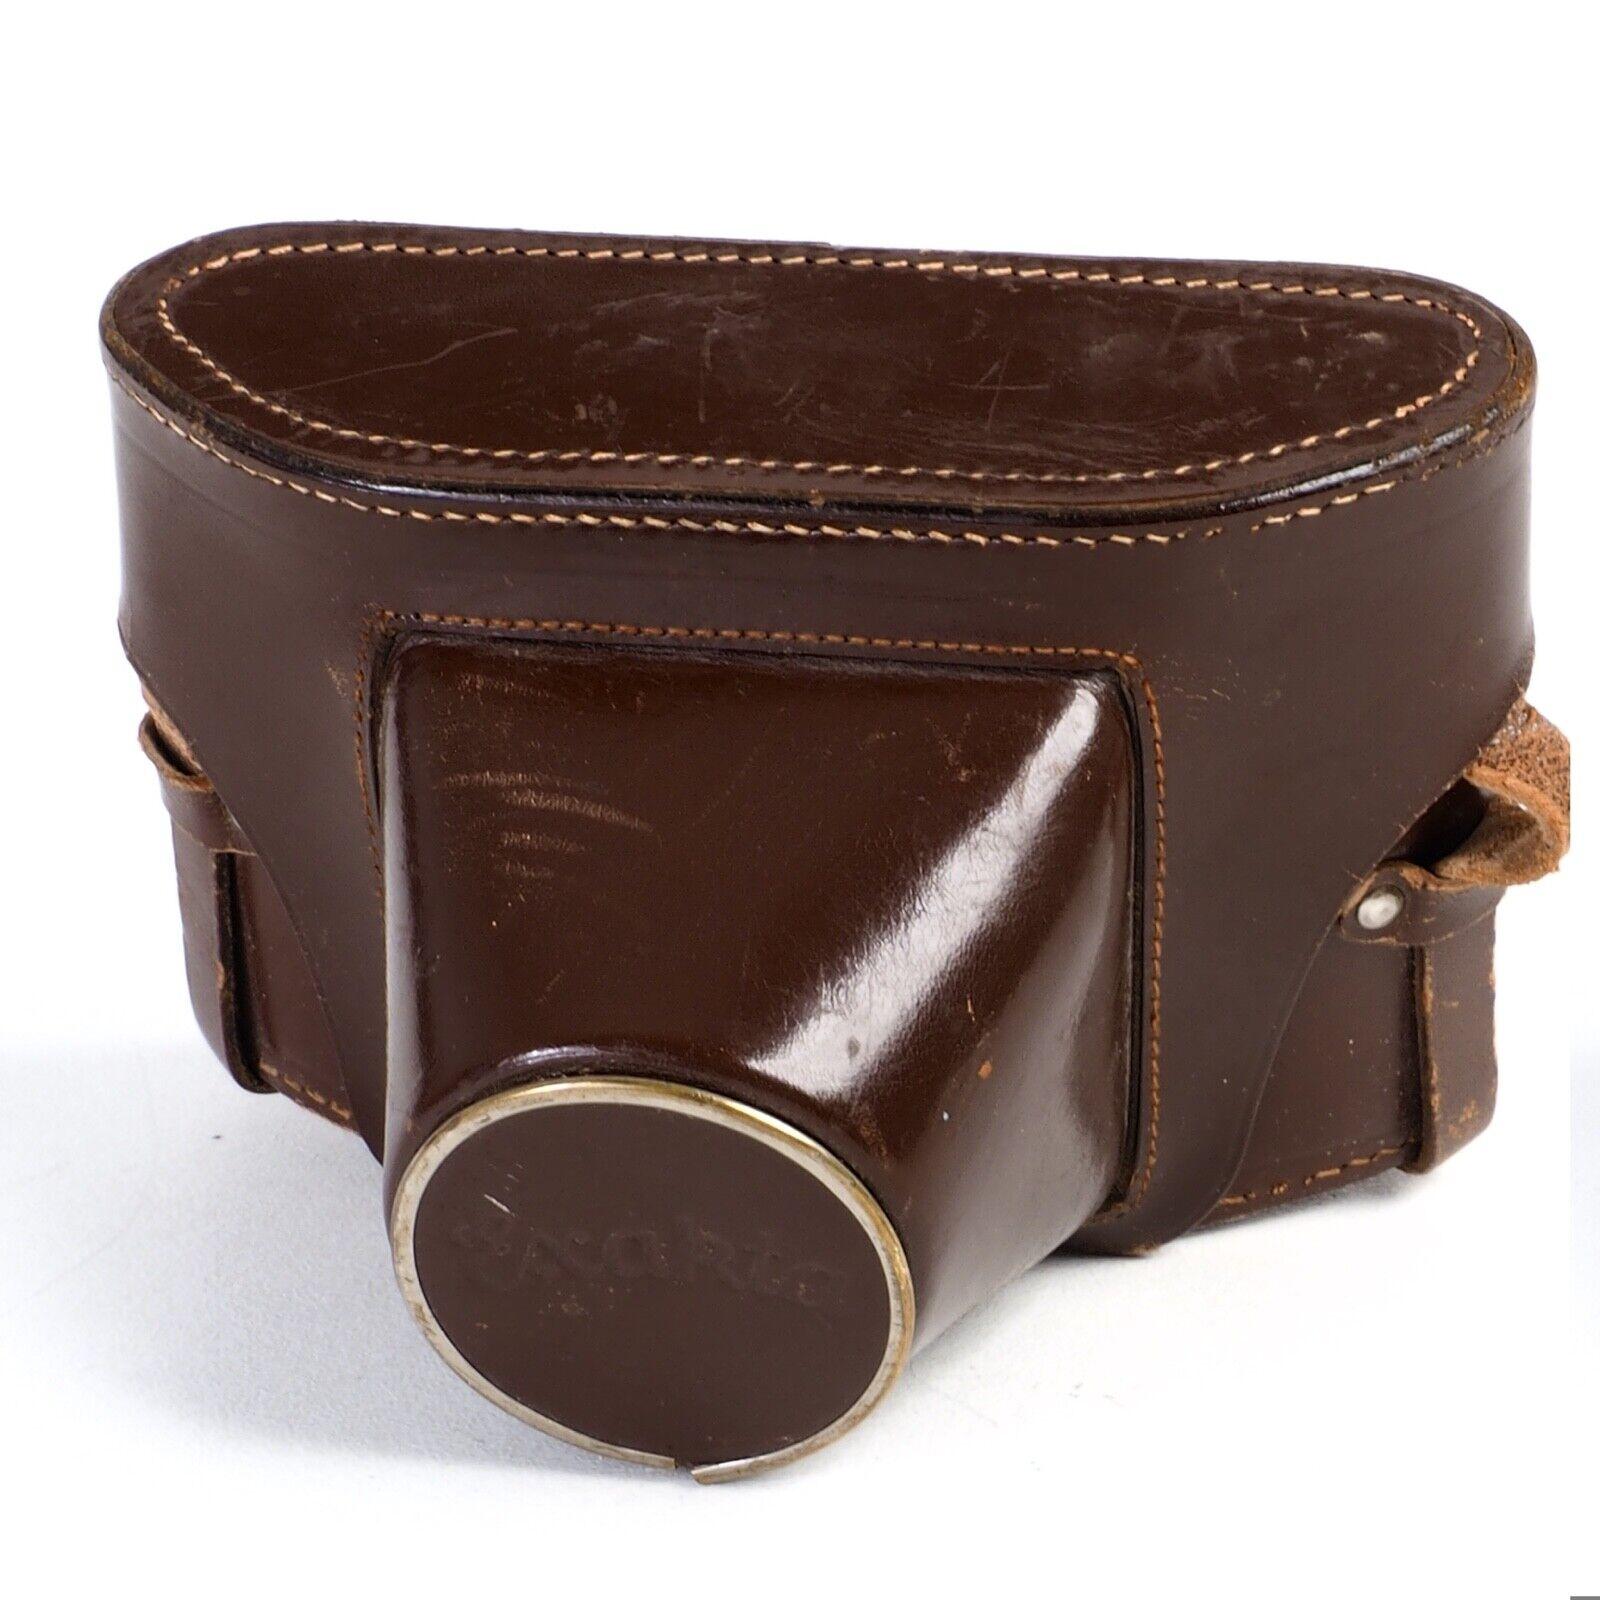 ^ Exakta Varex VX Leather Camera Everready Case [Missing Tripod Screw]